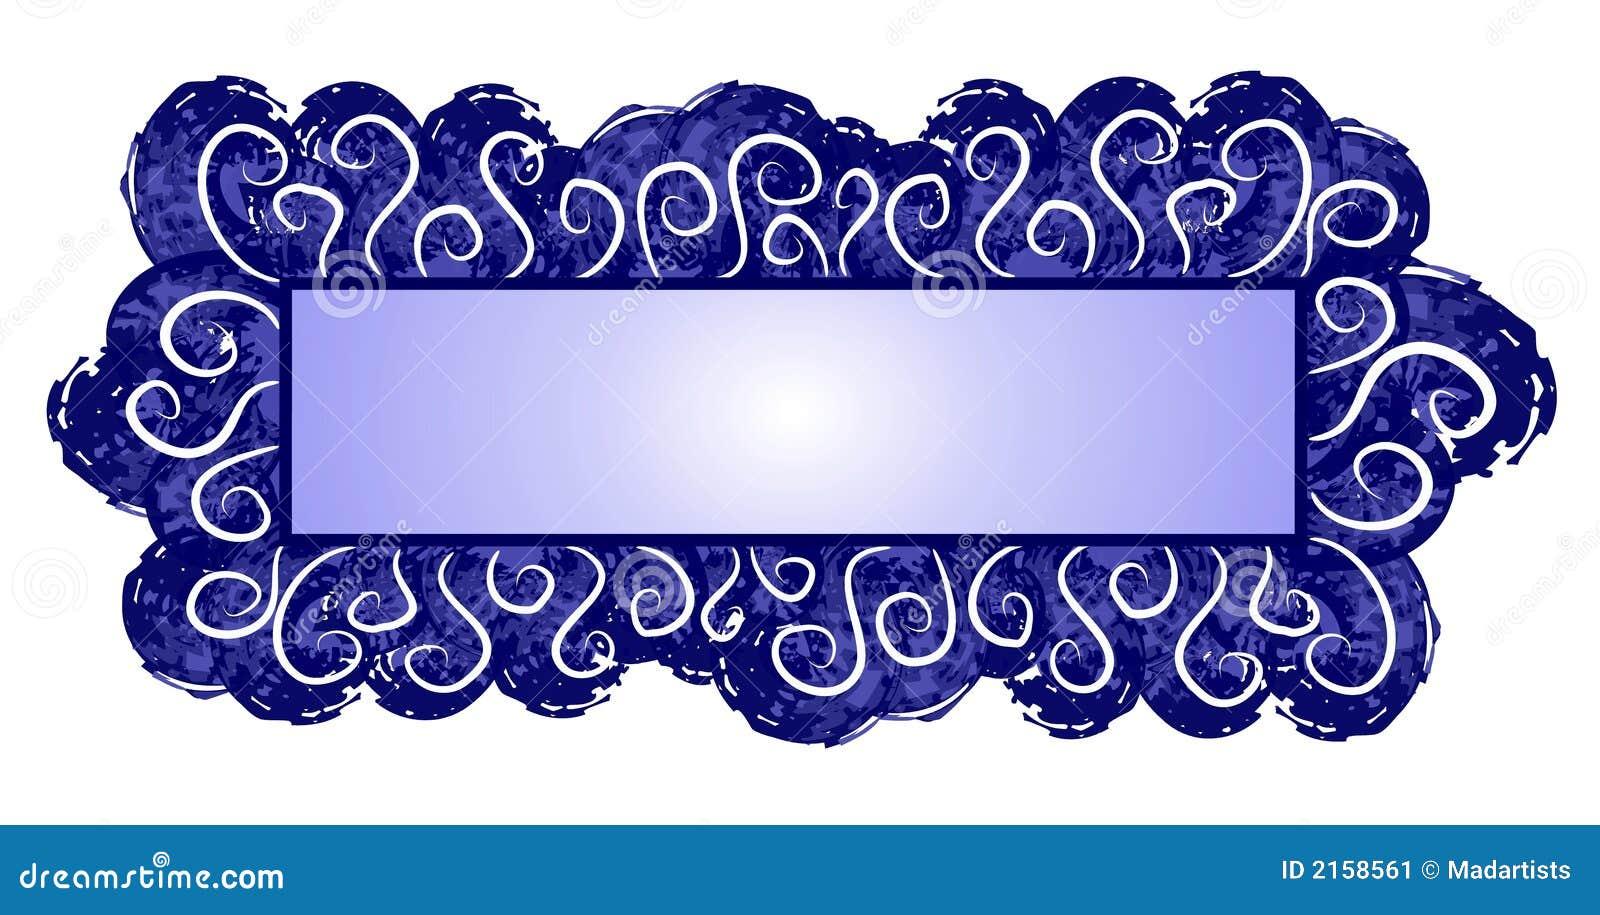 Obscuridade do logotipo do Web page - redemoinhos do azul